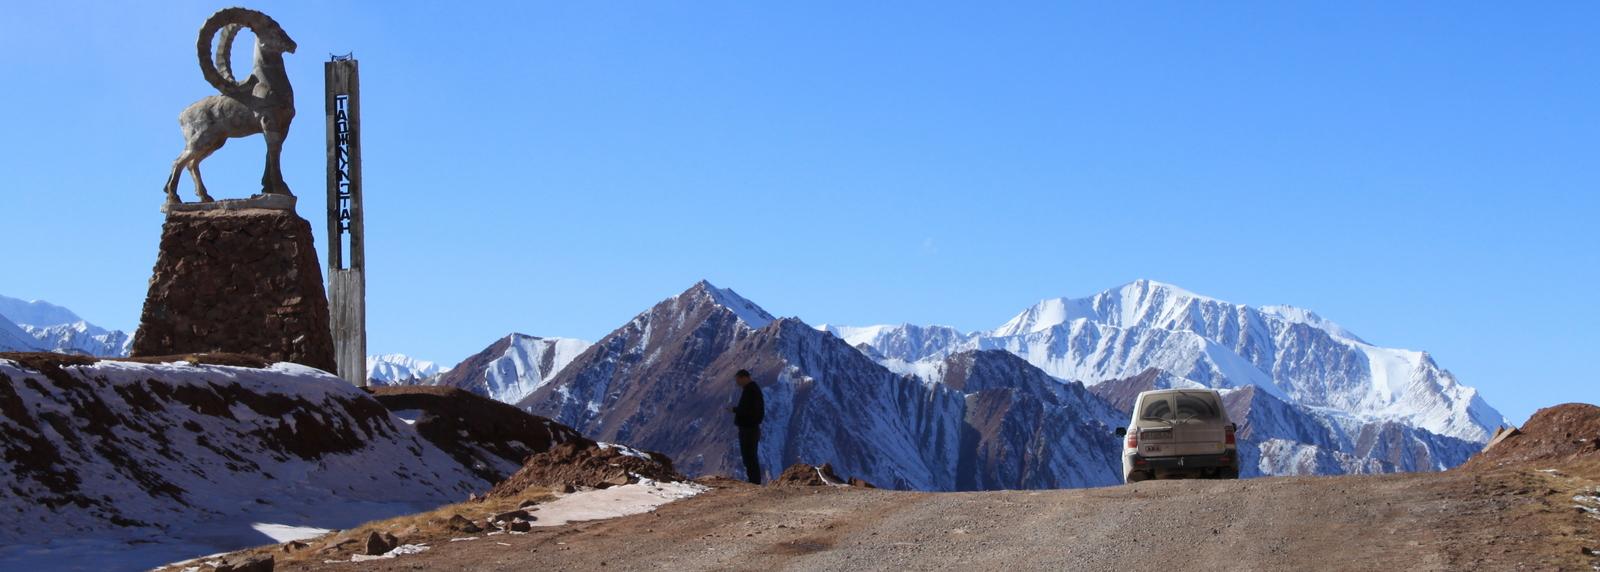 Kyzyk Art Pass neutral zone, border between Tadzjikistan and Kirgizstan